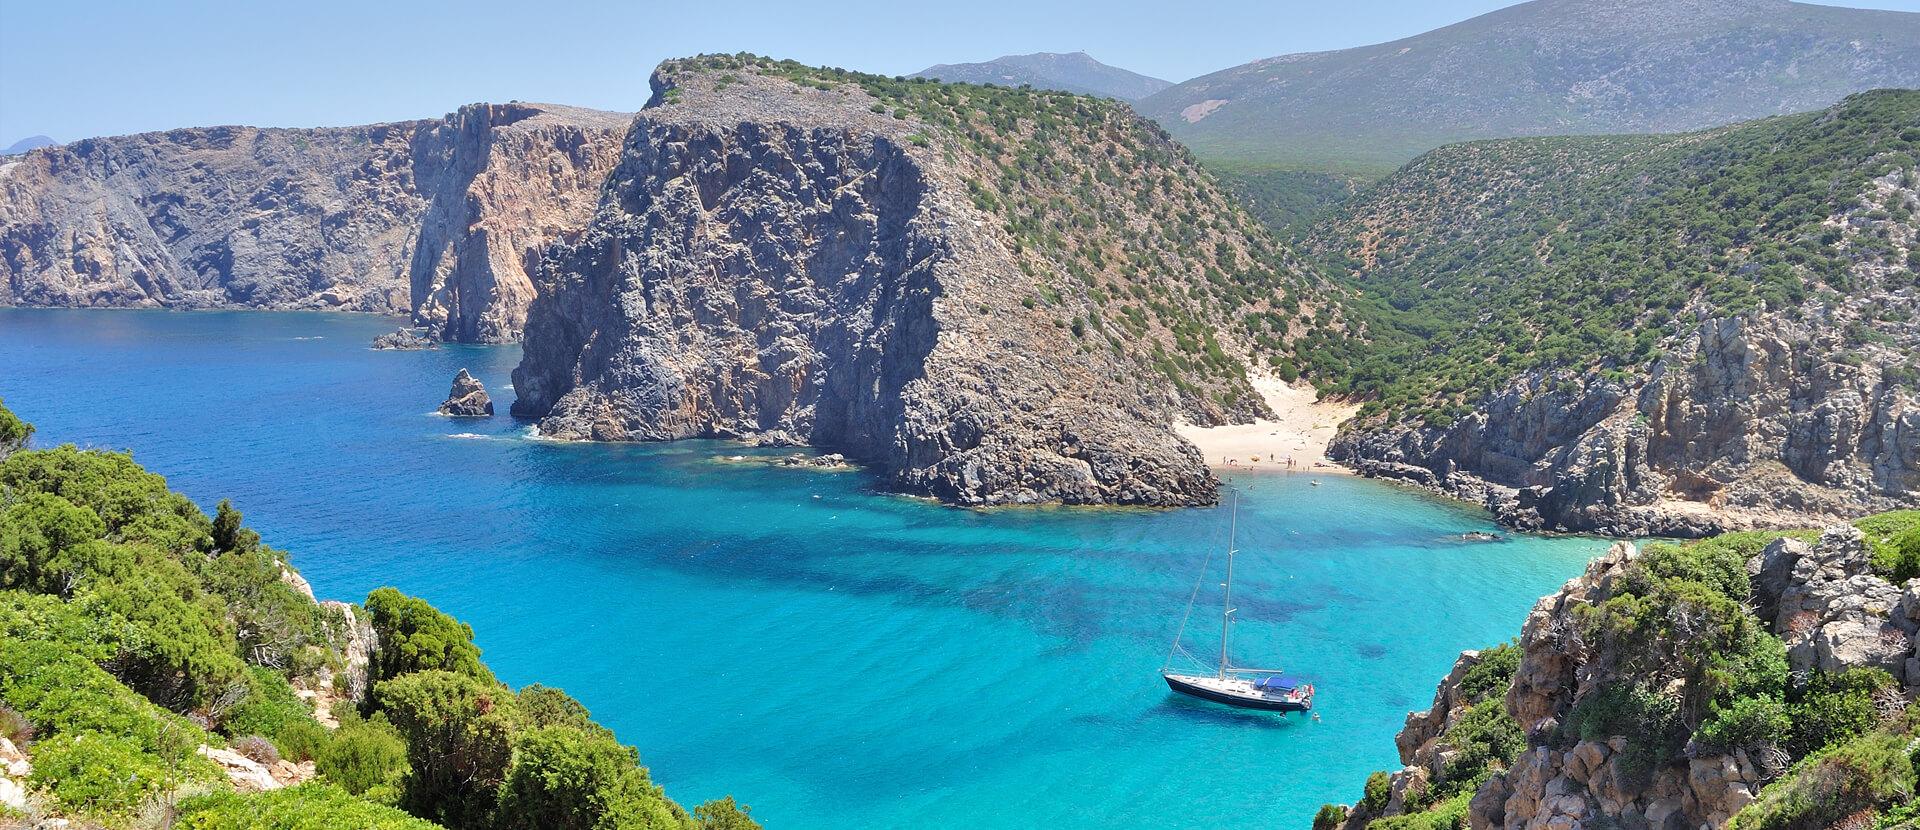 Siciliy & Sardinia